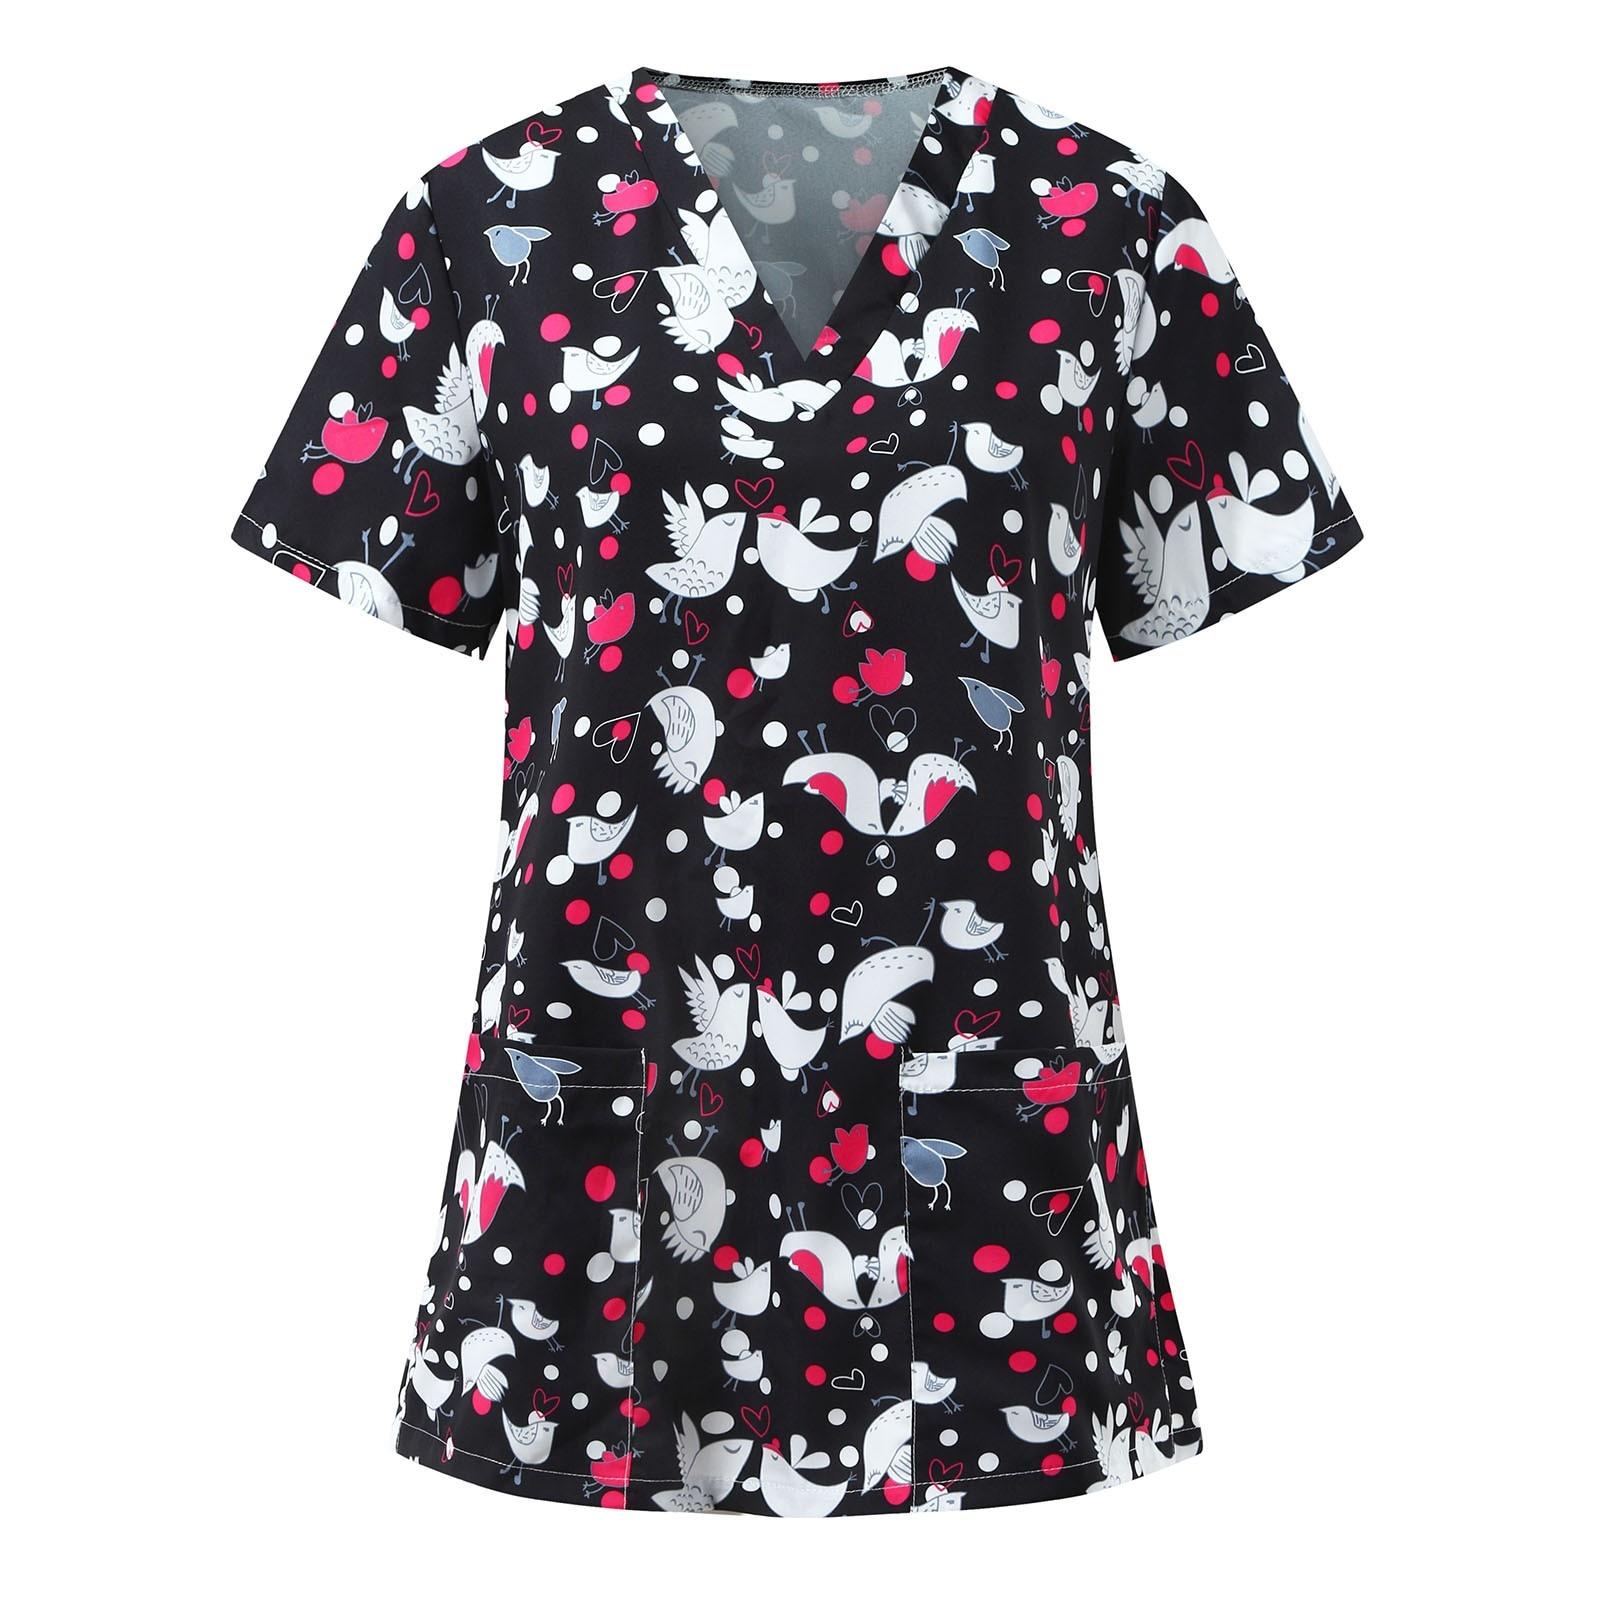 Summer Worker Tops 2021 NEW For Women Uniform Plus Size Nurse Uniforms Cartoon Animal Printed Short Sleeve V-Neck Carer Top A20